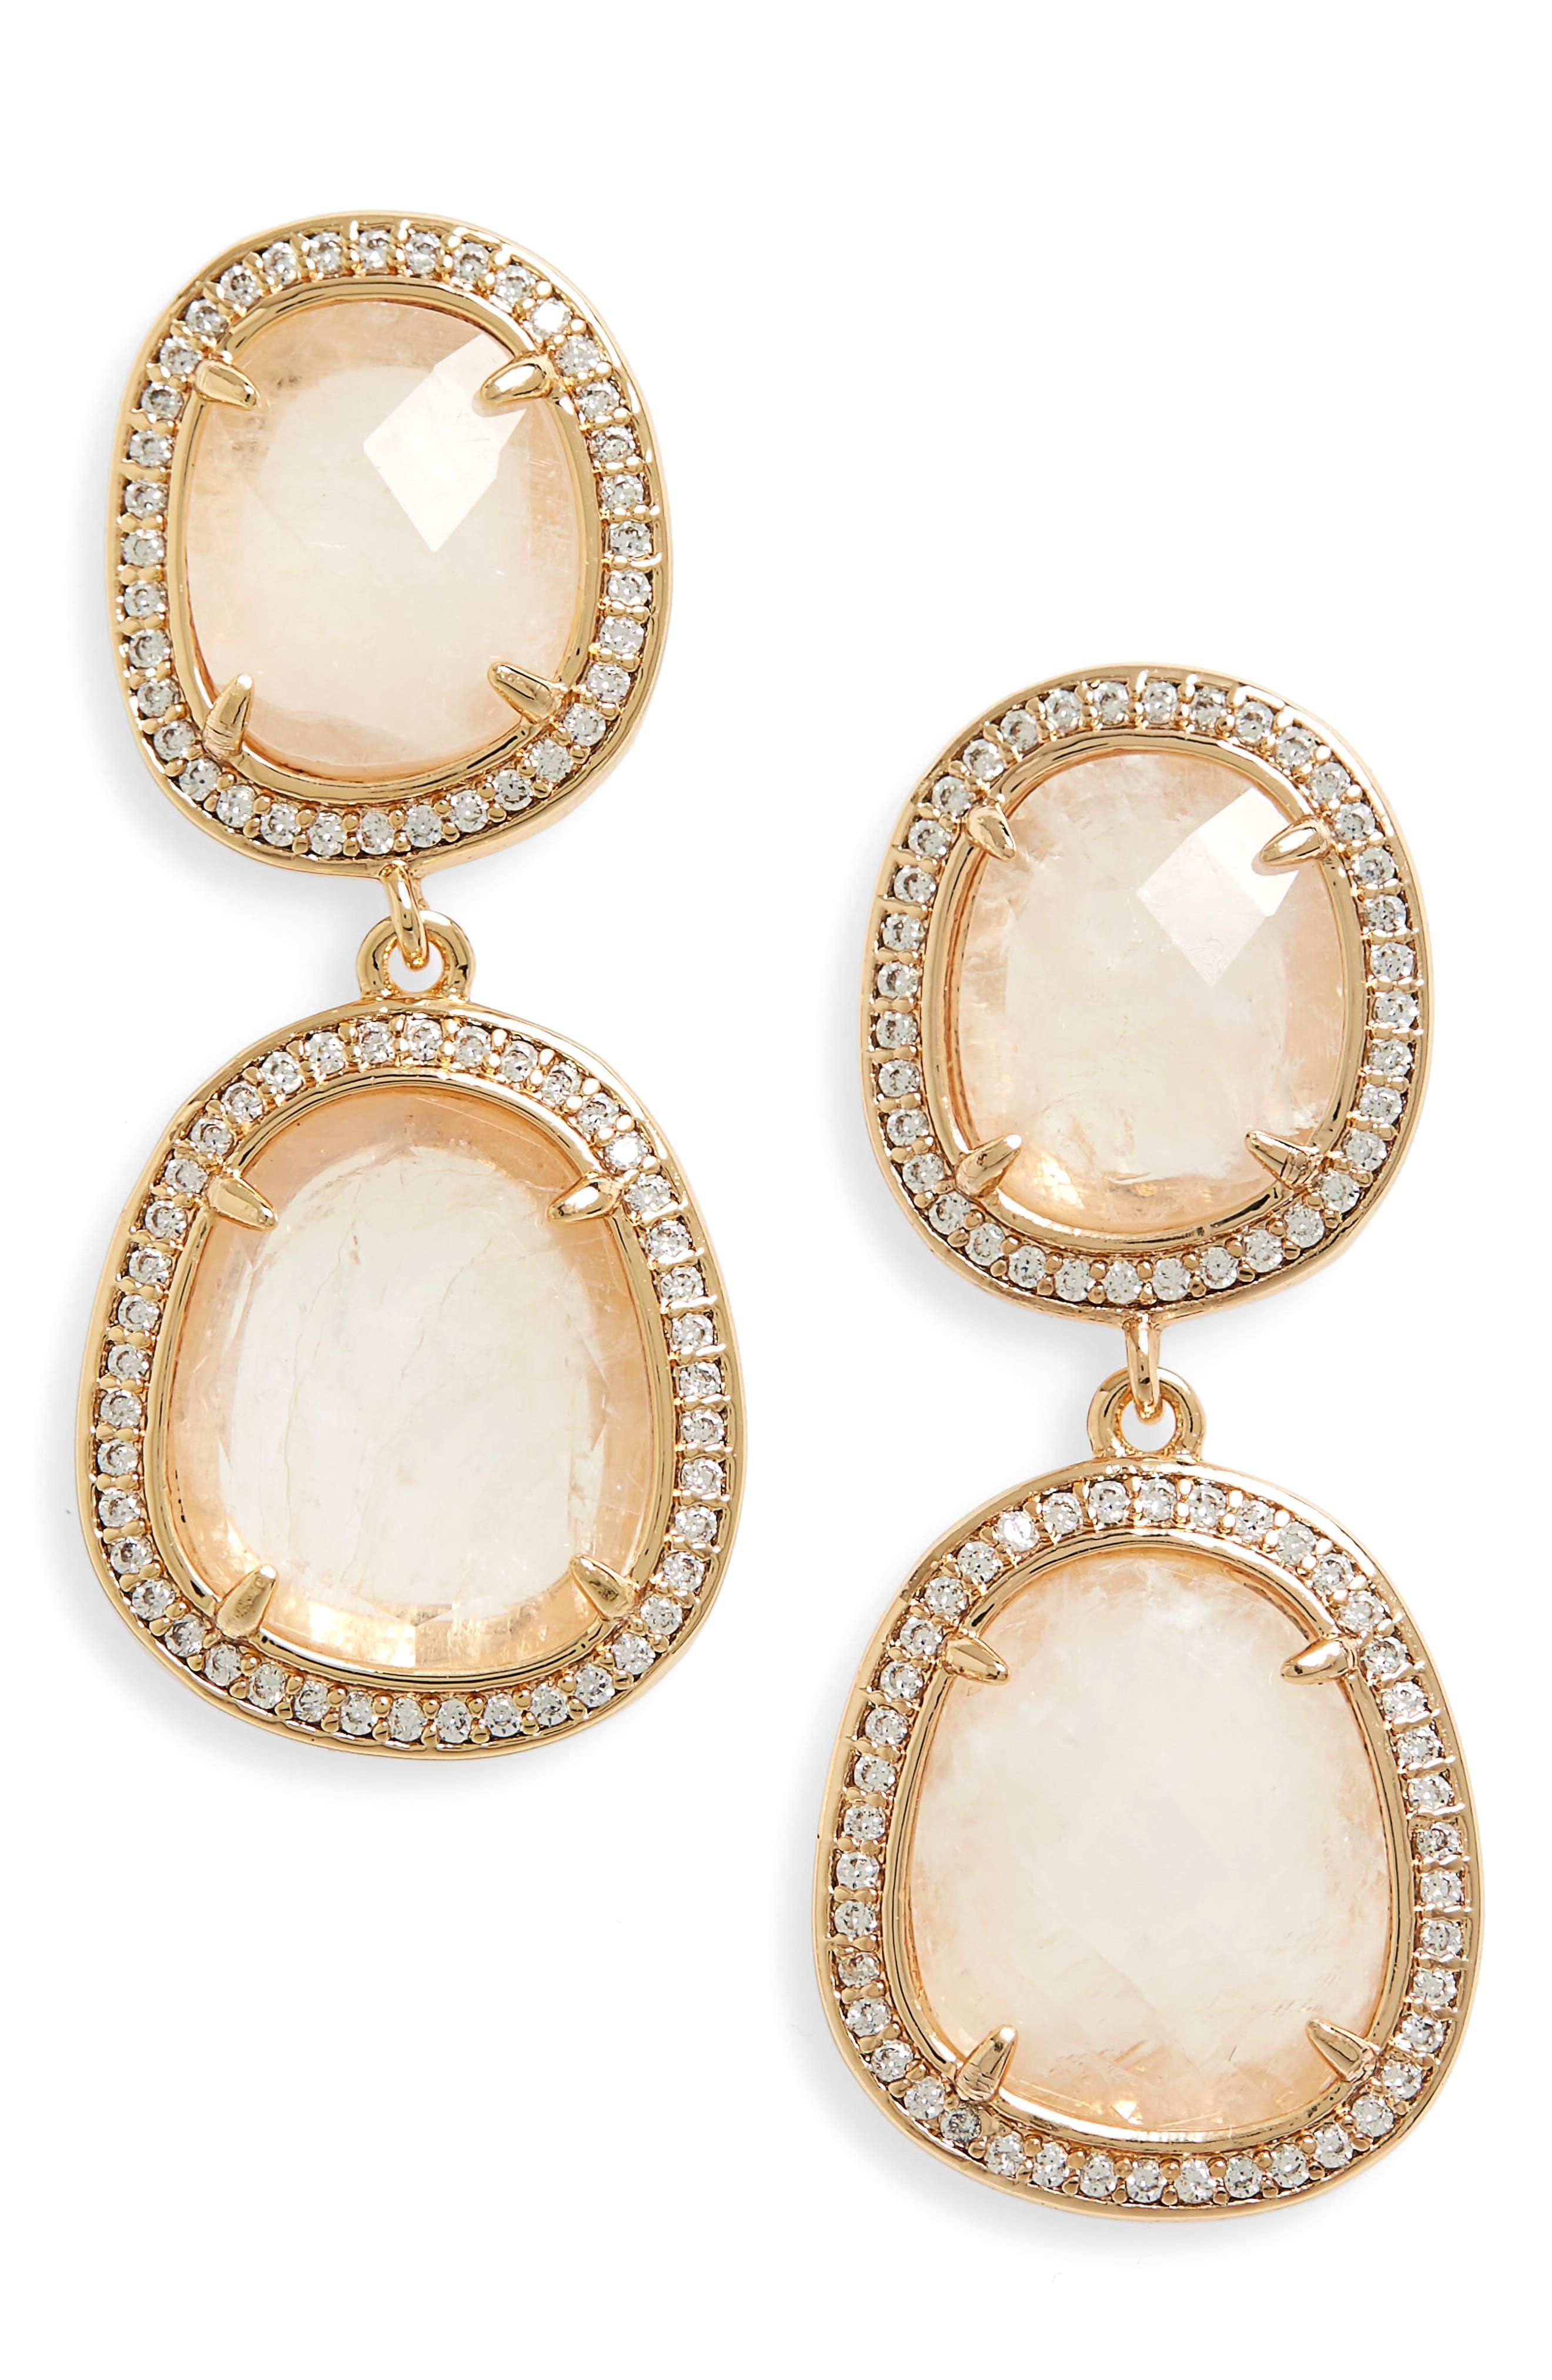 Double Drop Earrings,                         Main,                         color, Moonstone/ Gold